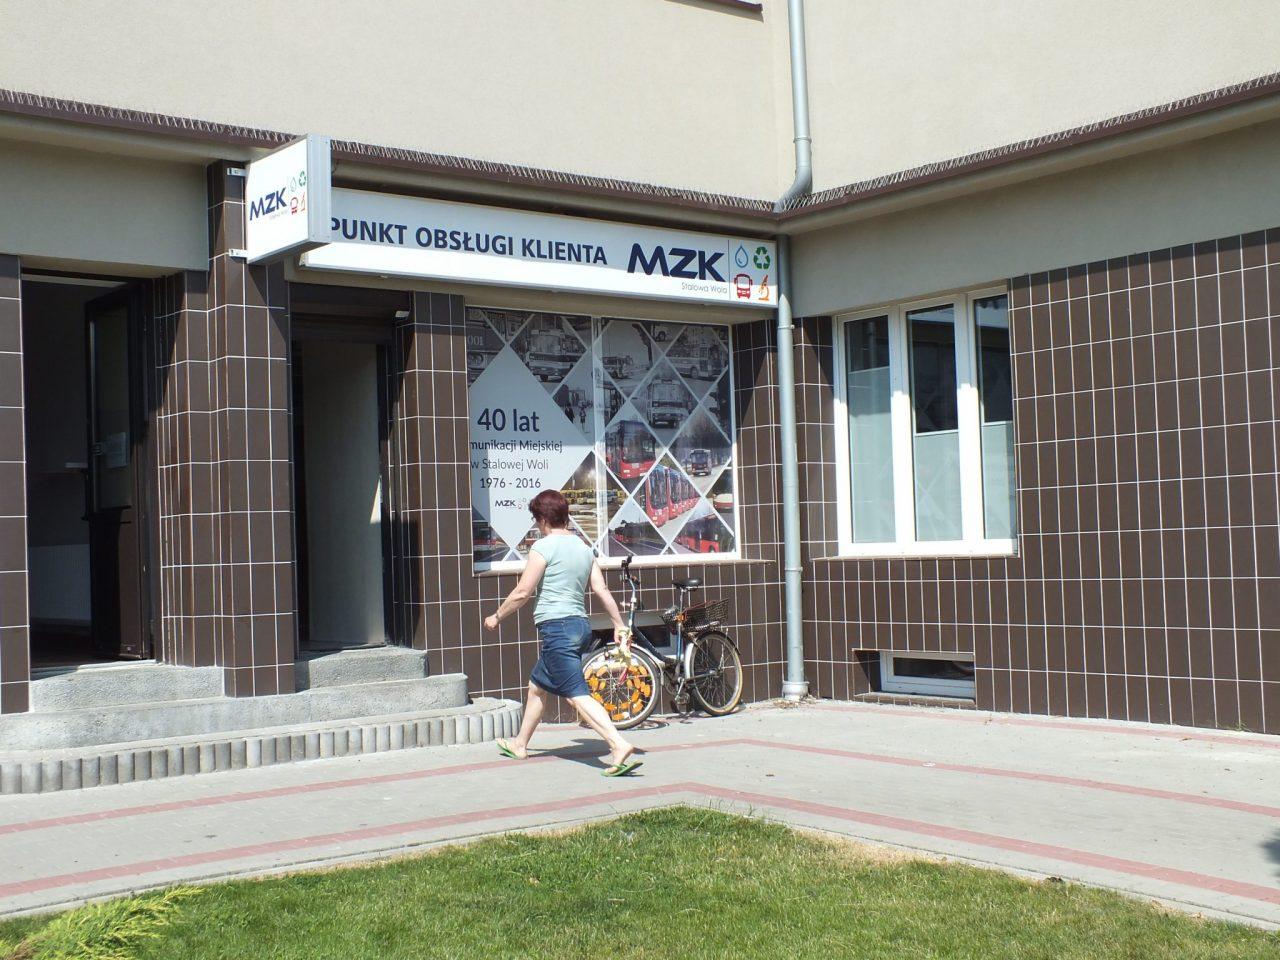 Punkt Obsługi Klienta MZK